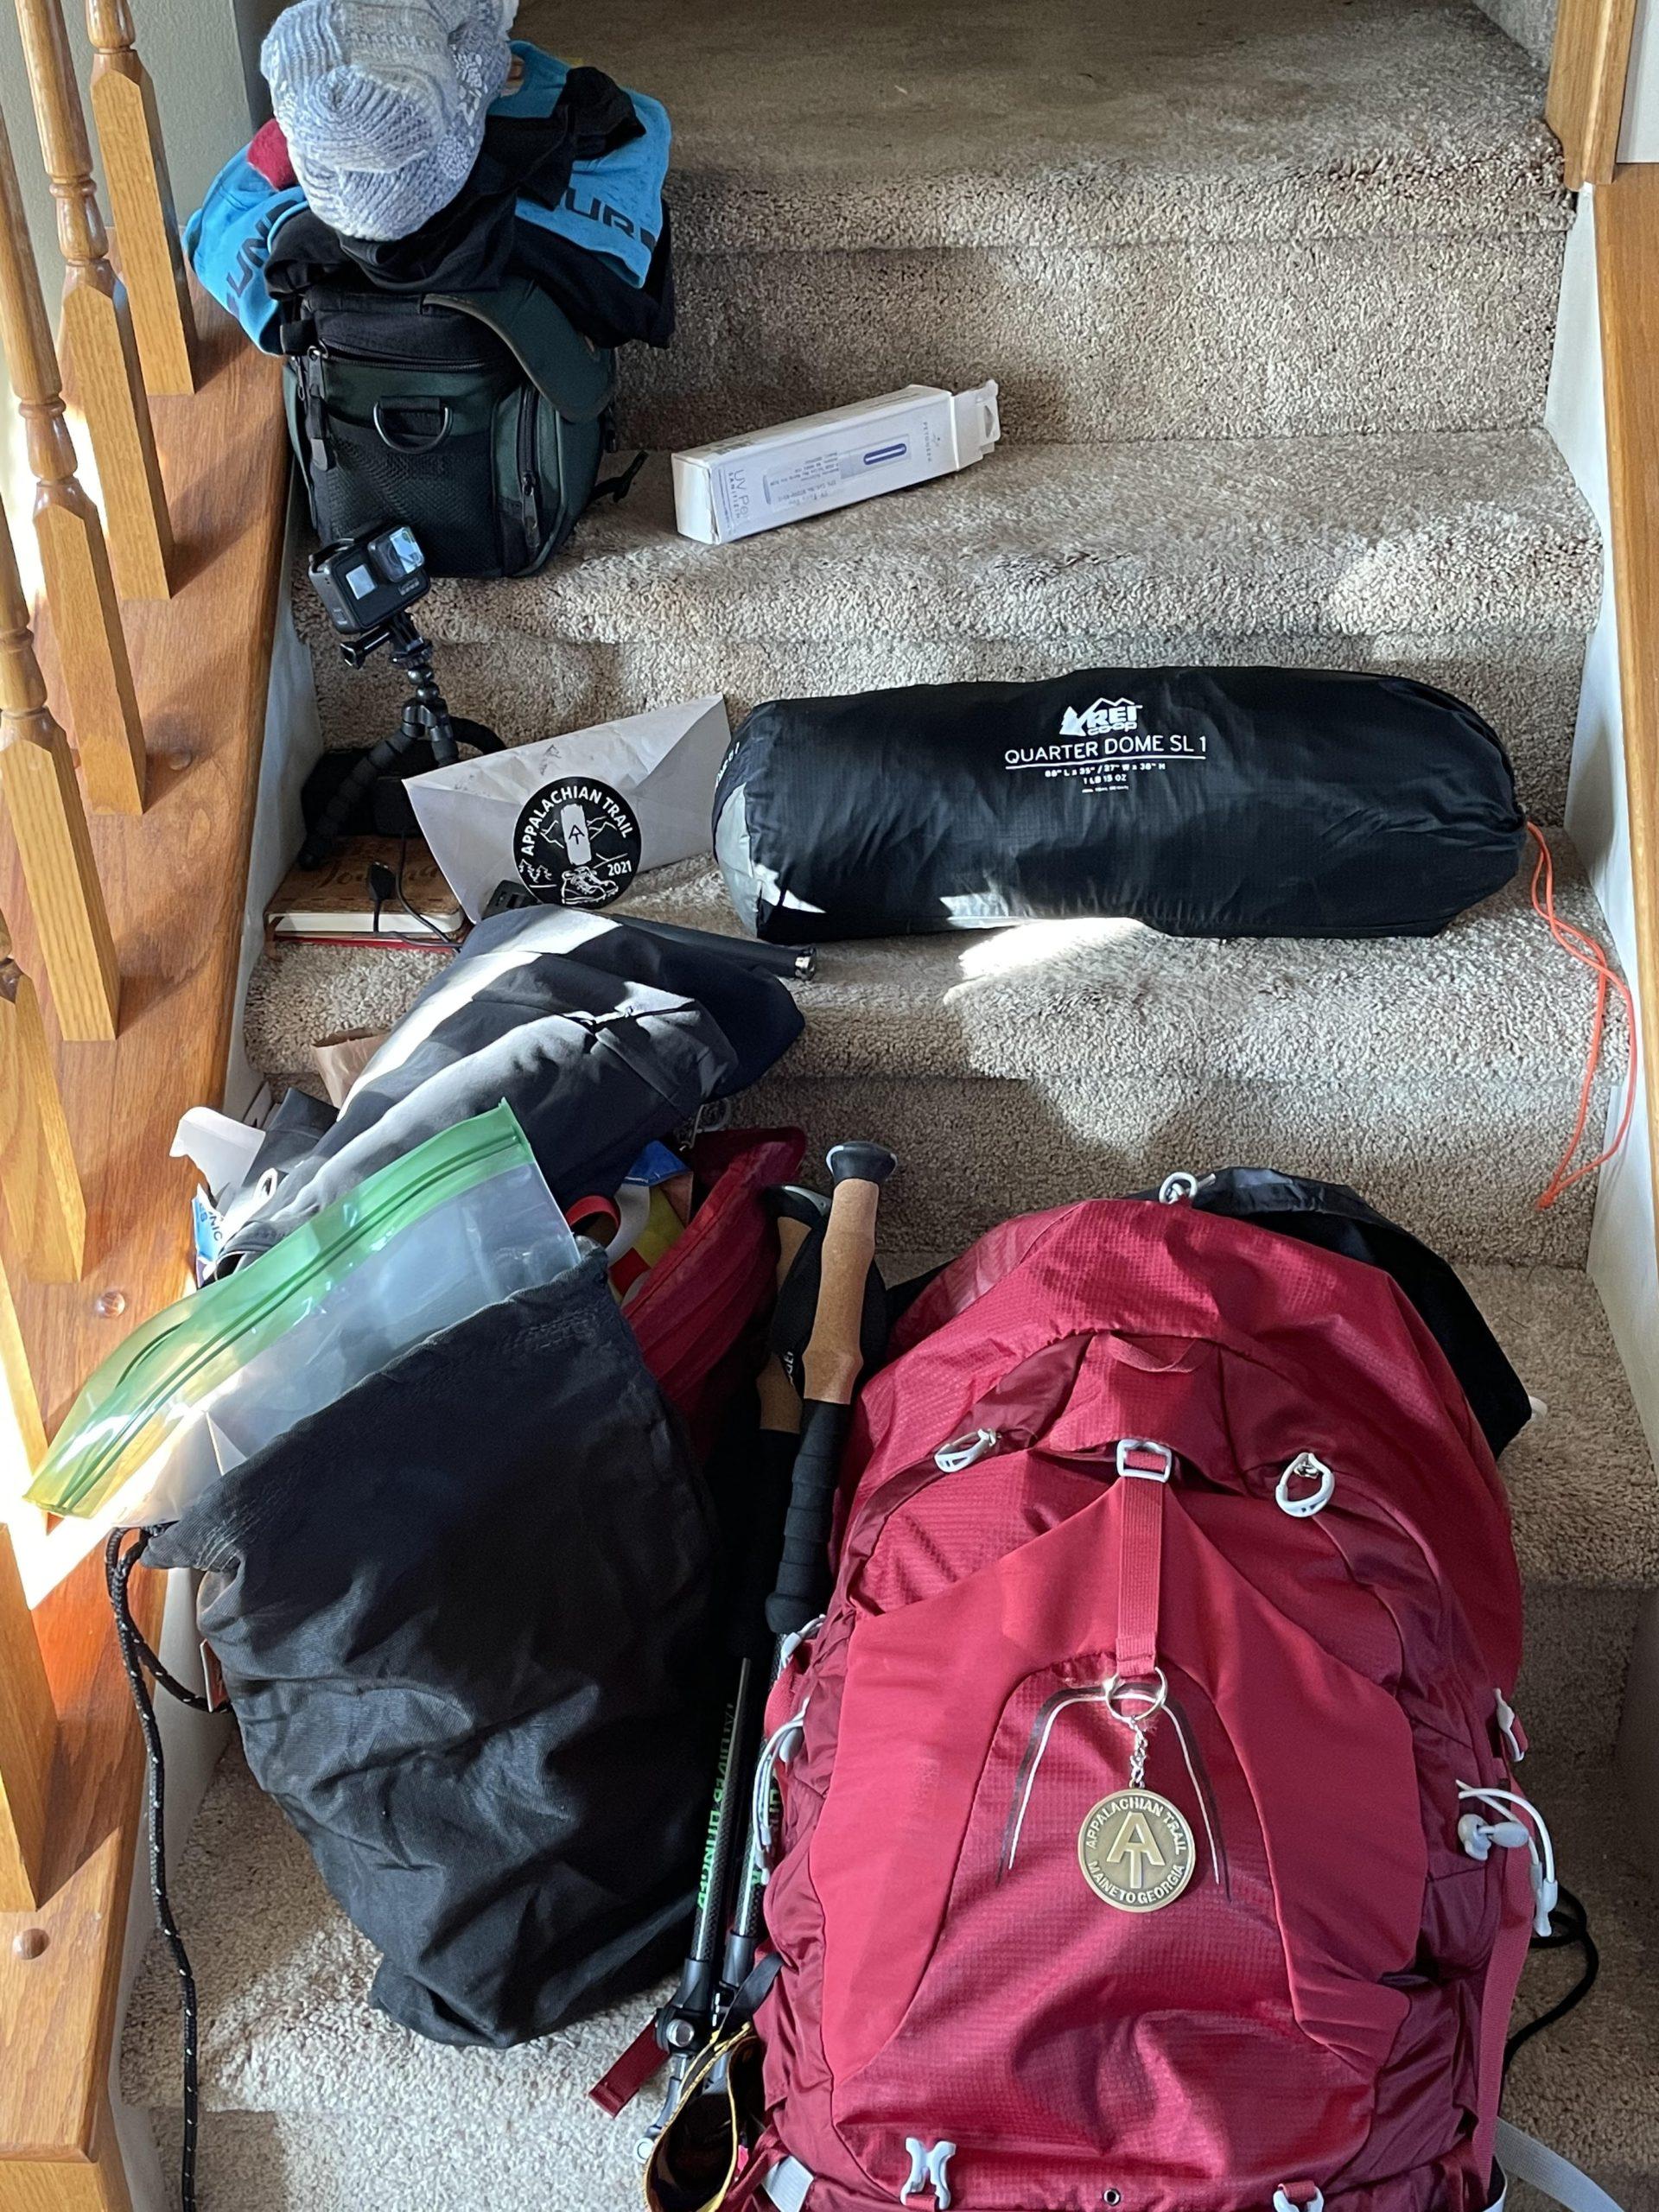 Appalachian Trail Gear Review for 2021 Thru-hike